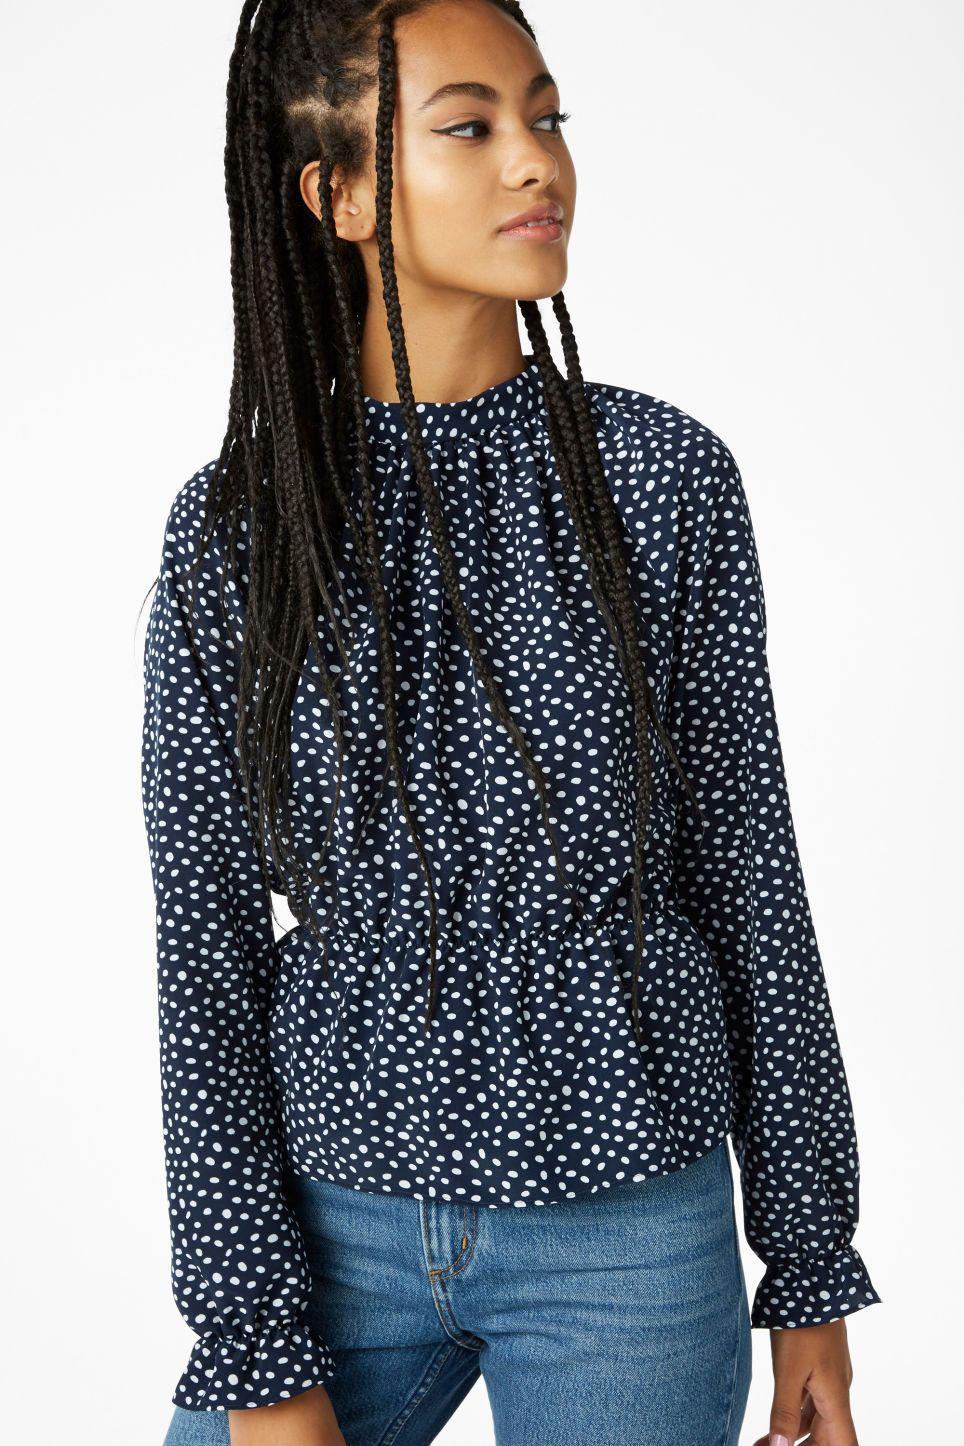 High Neck Polka Dot Blouse - Black and white Monki Discounts Cheap Manchester Great Sale zMfwY9bZH